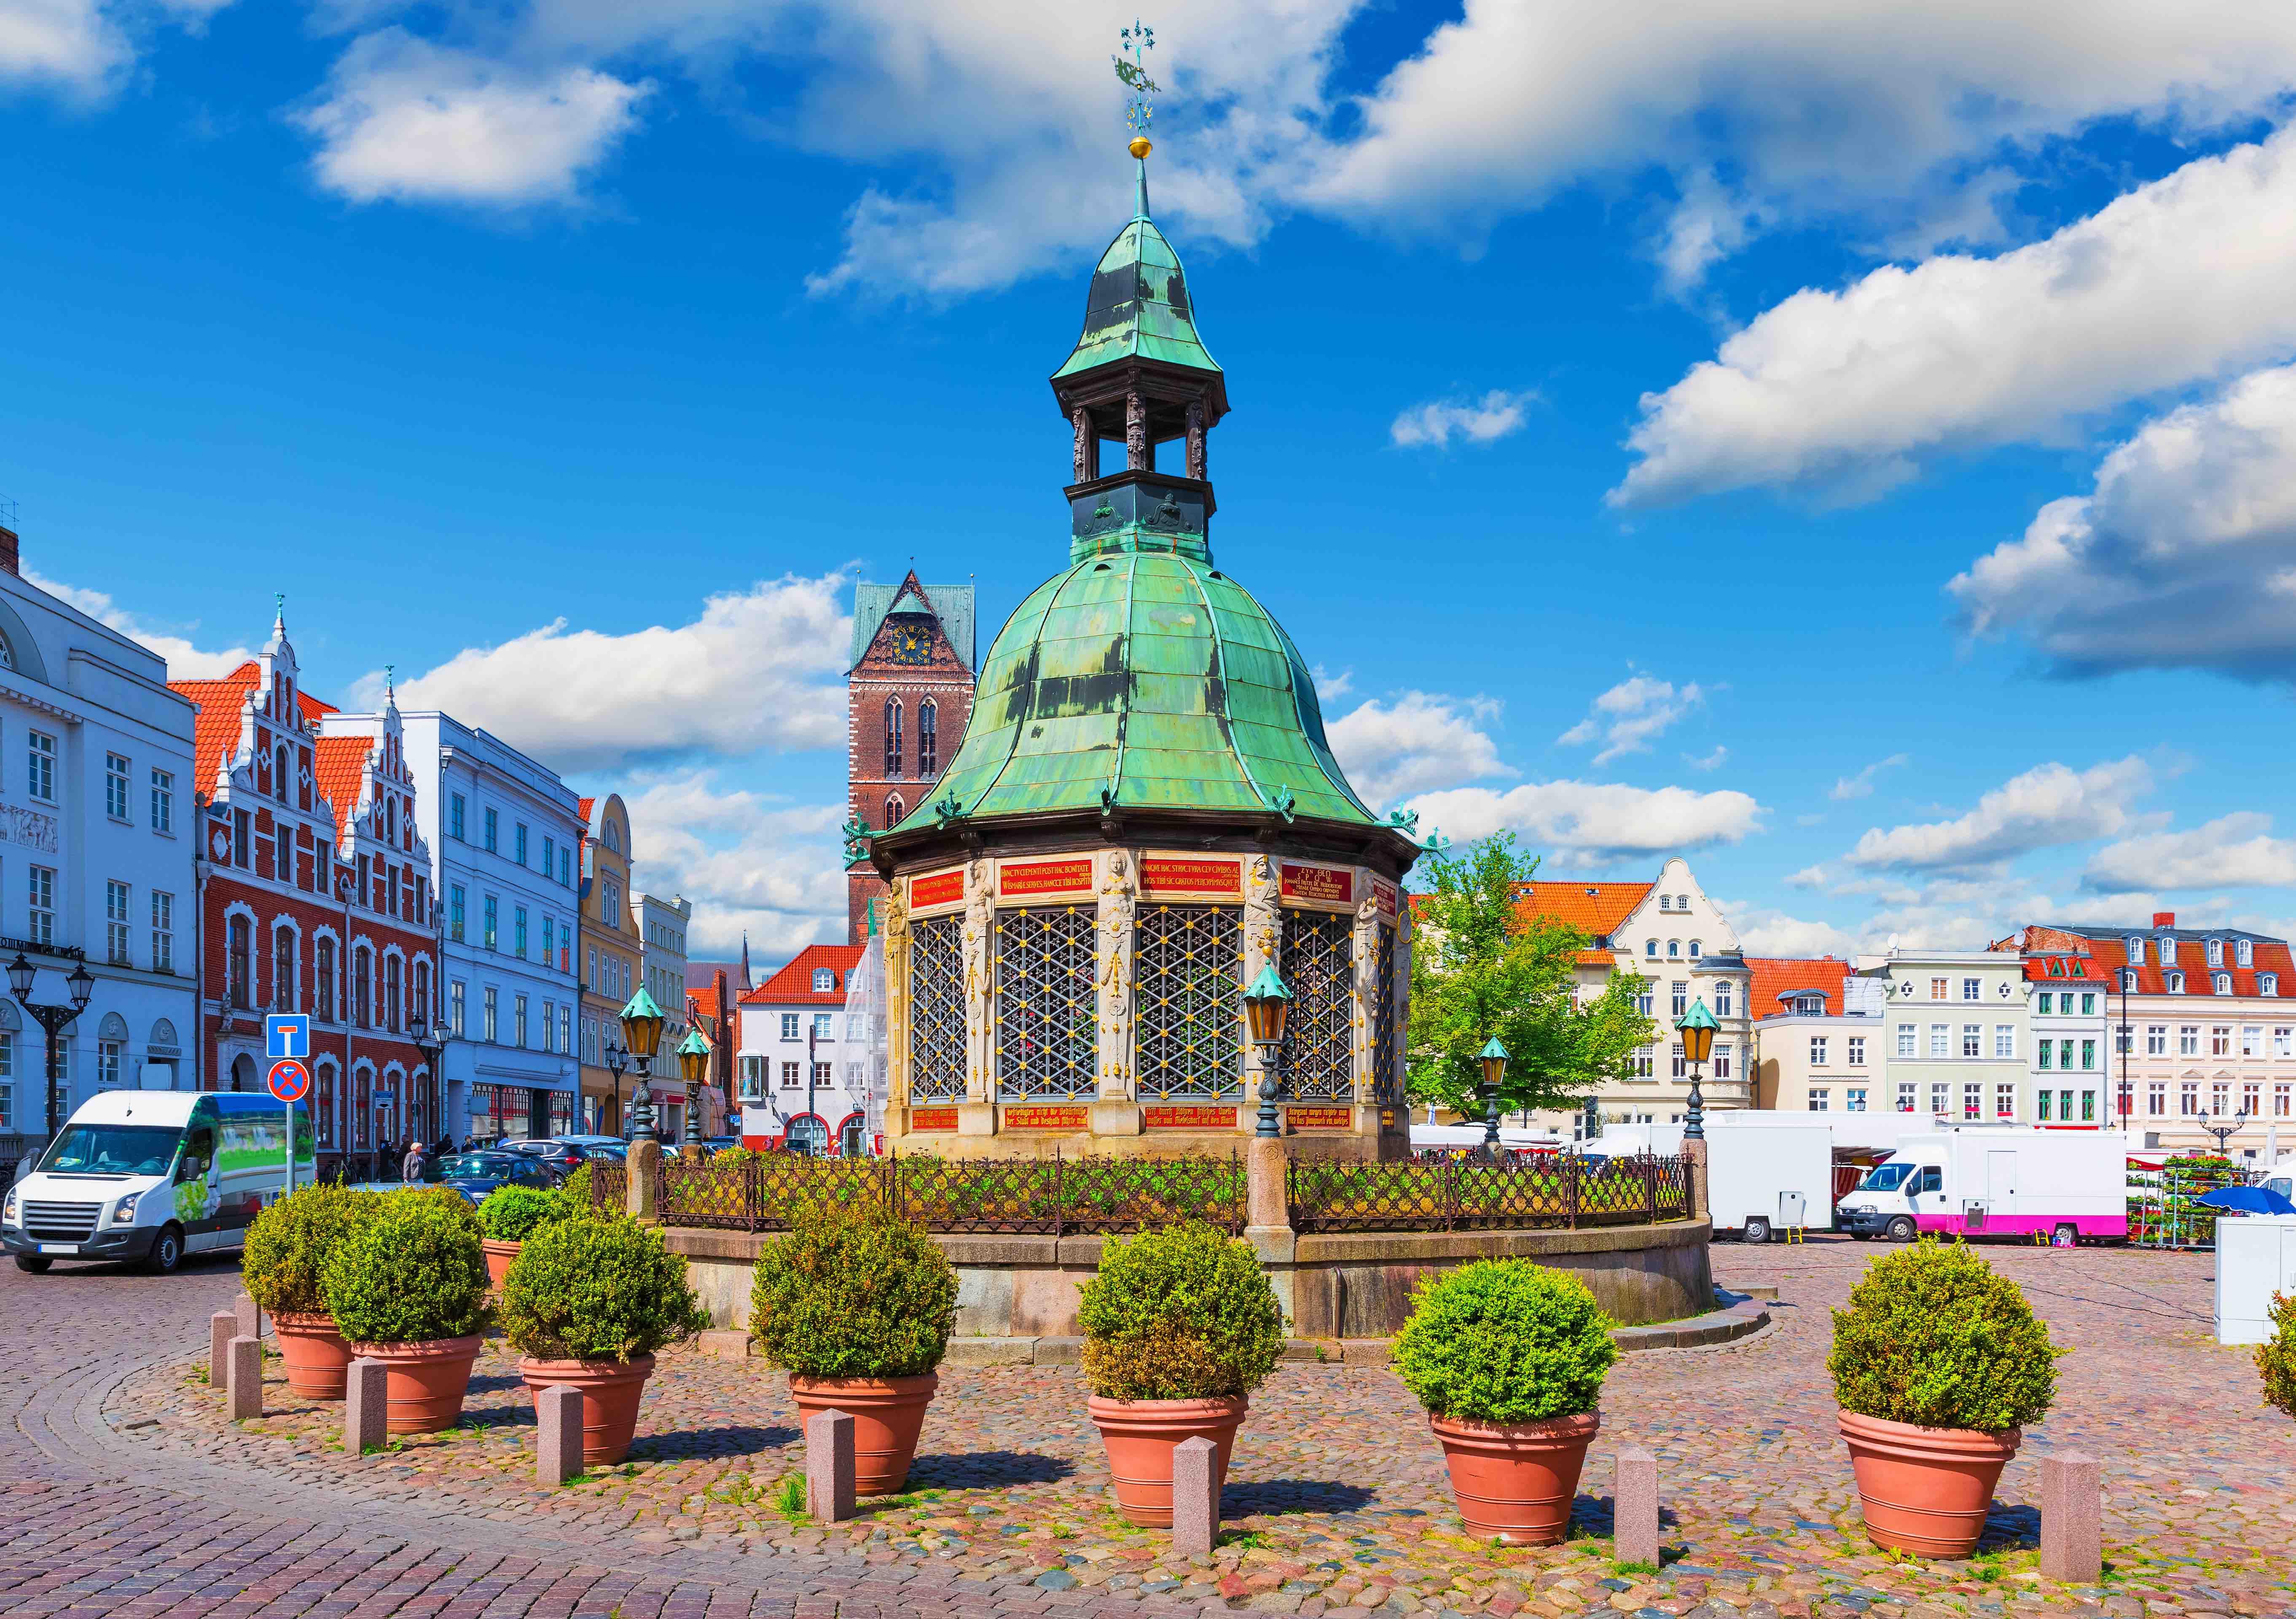 Bernd_Lüdtke_Immobilien_Wismar_Marktplat